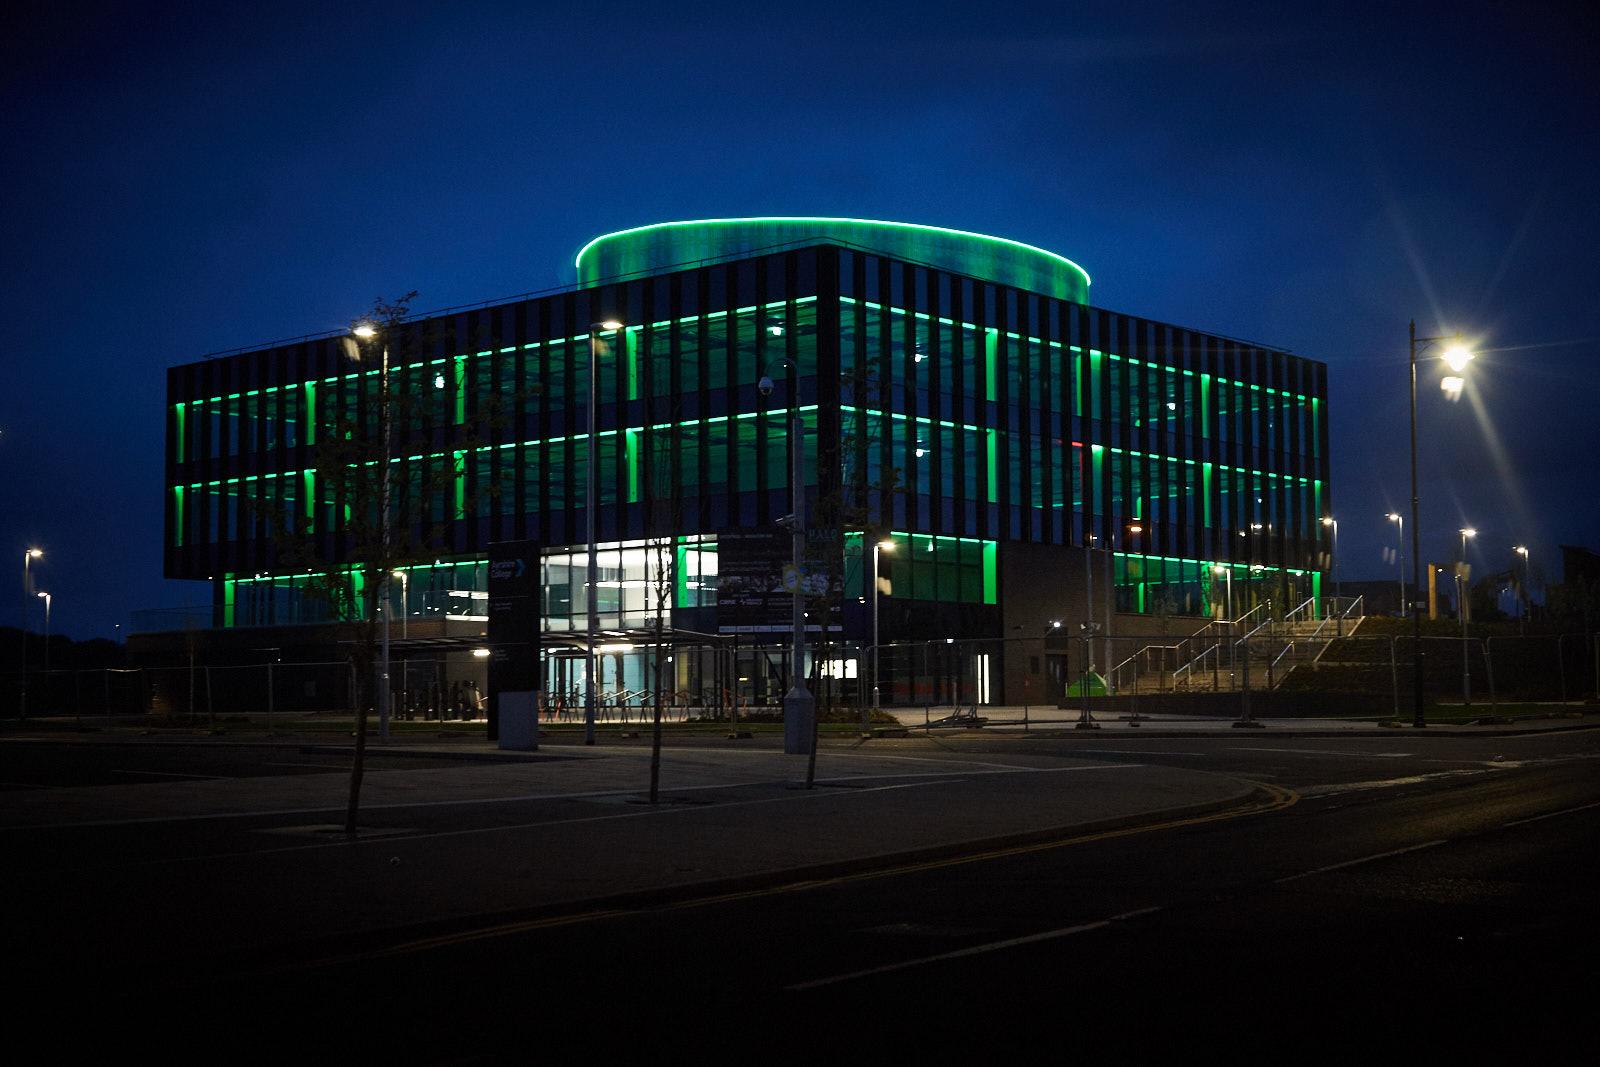 HALO Kilmarnock shines as a beacon of hope during Mental Health Awareness Week